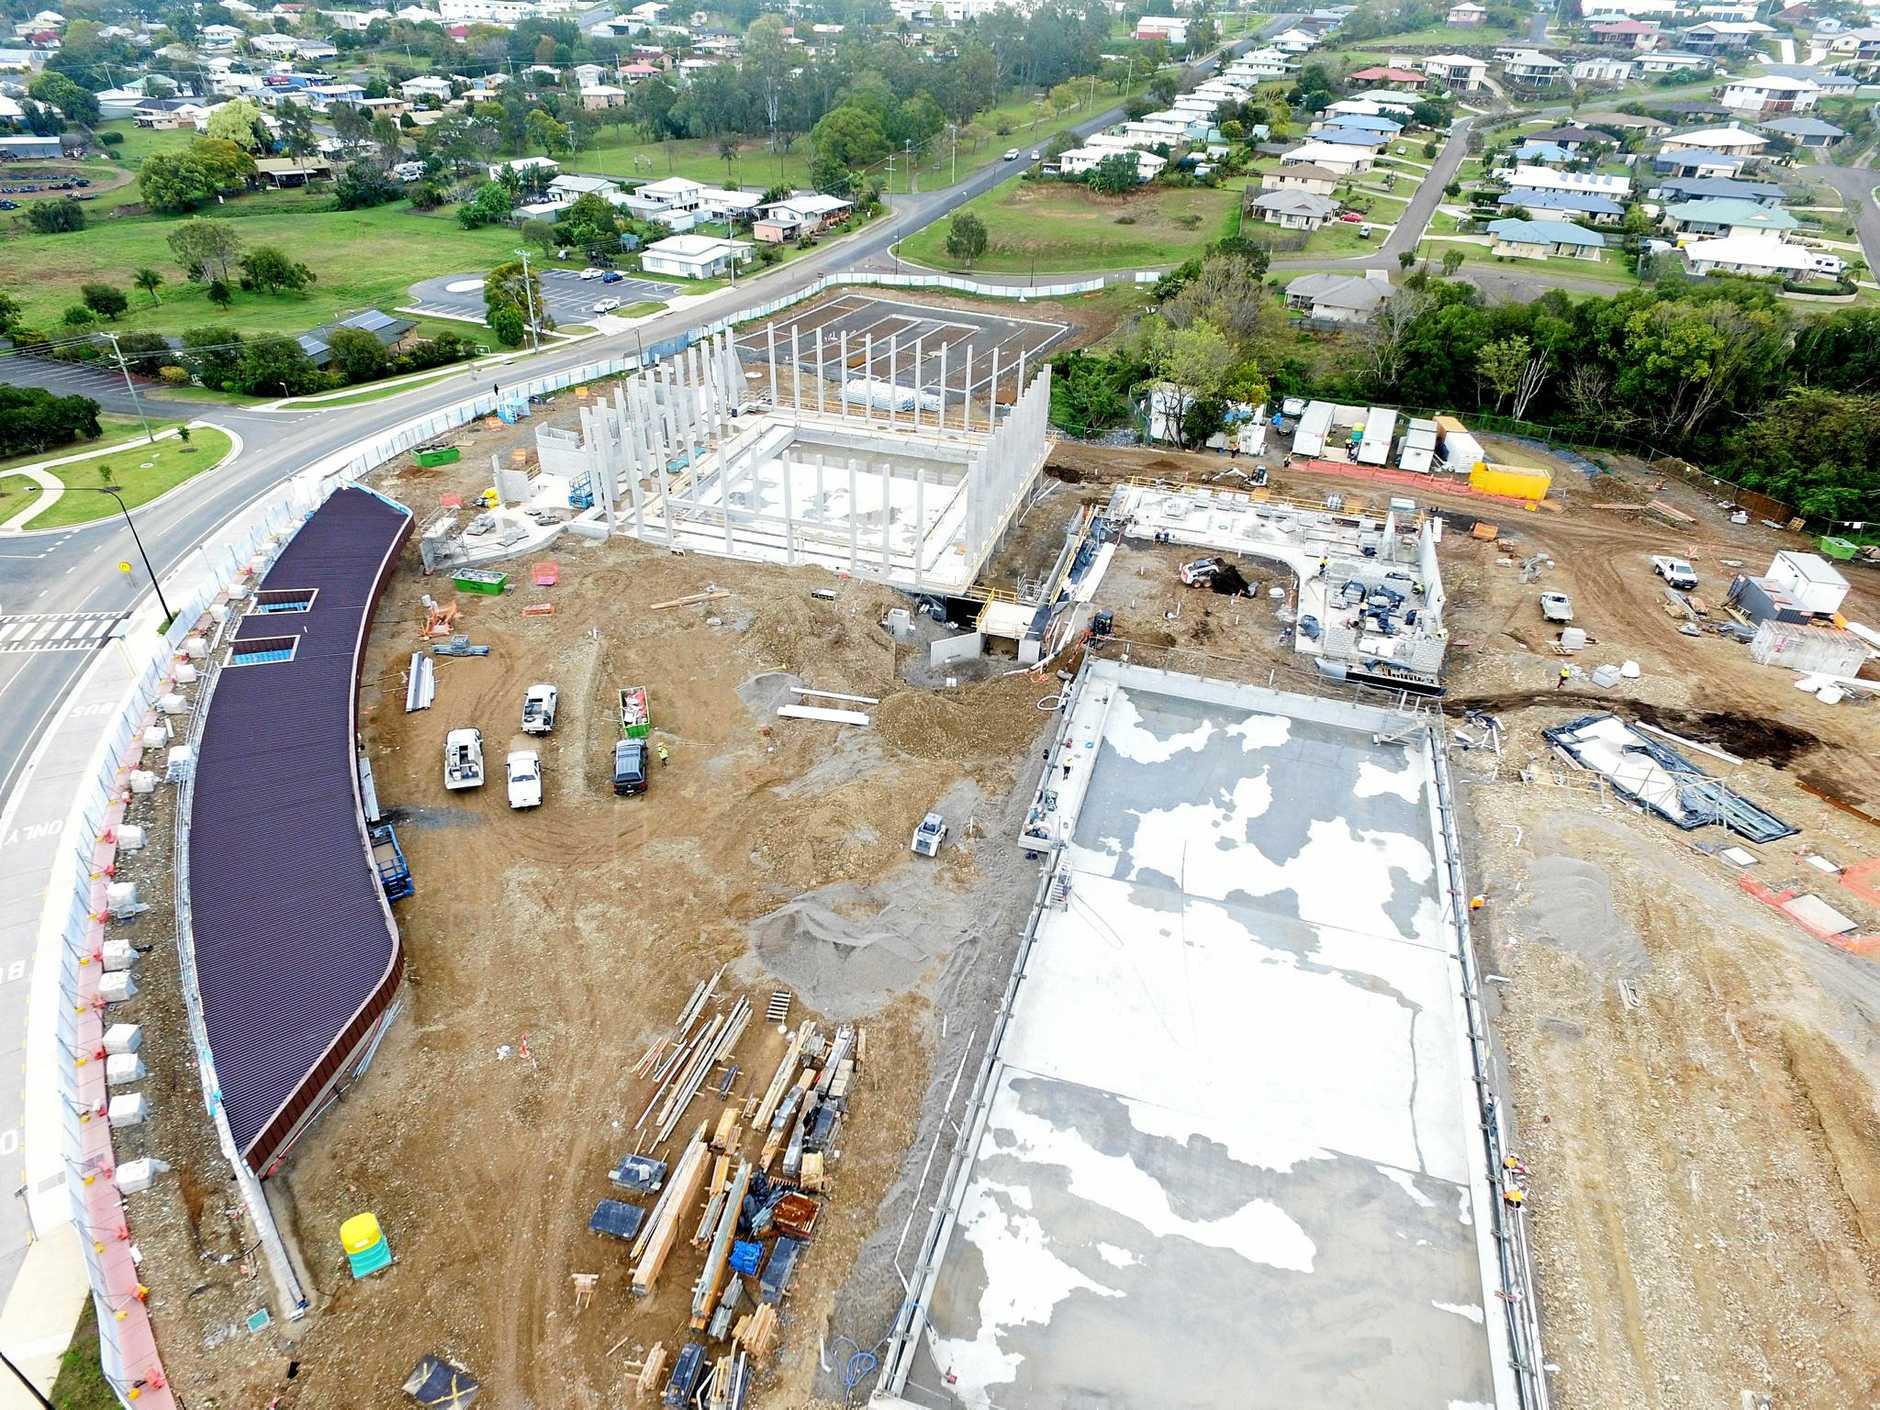 Aquatic centre under construction in Gympie.